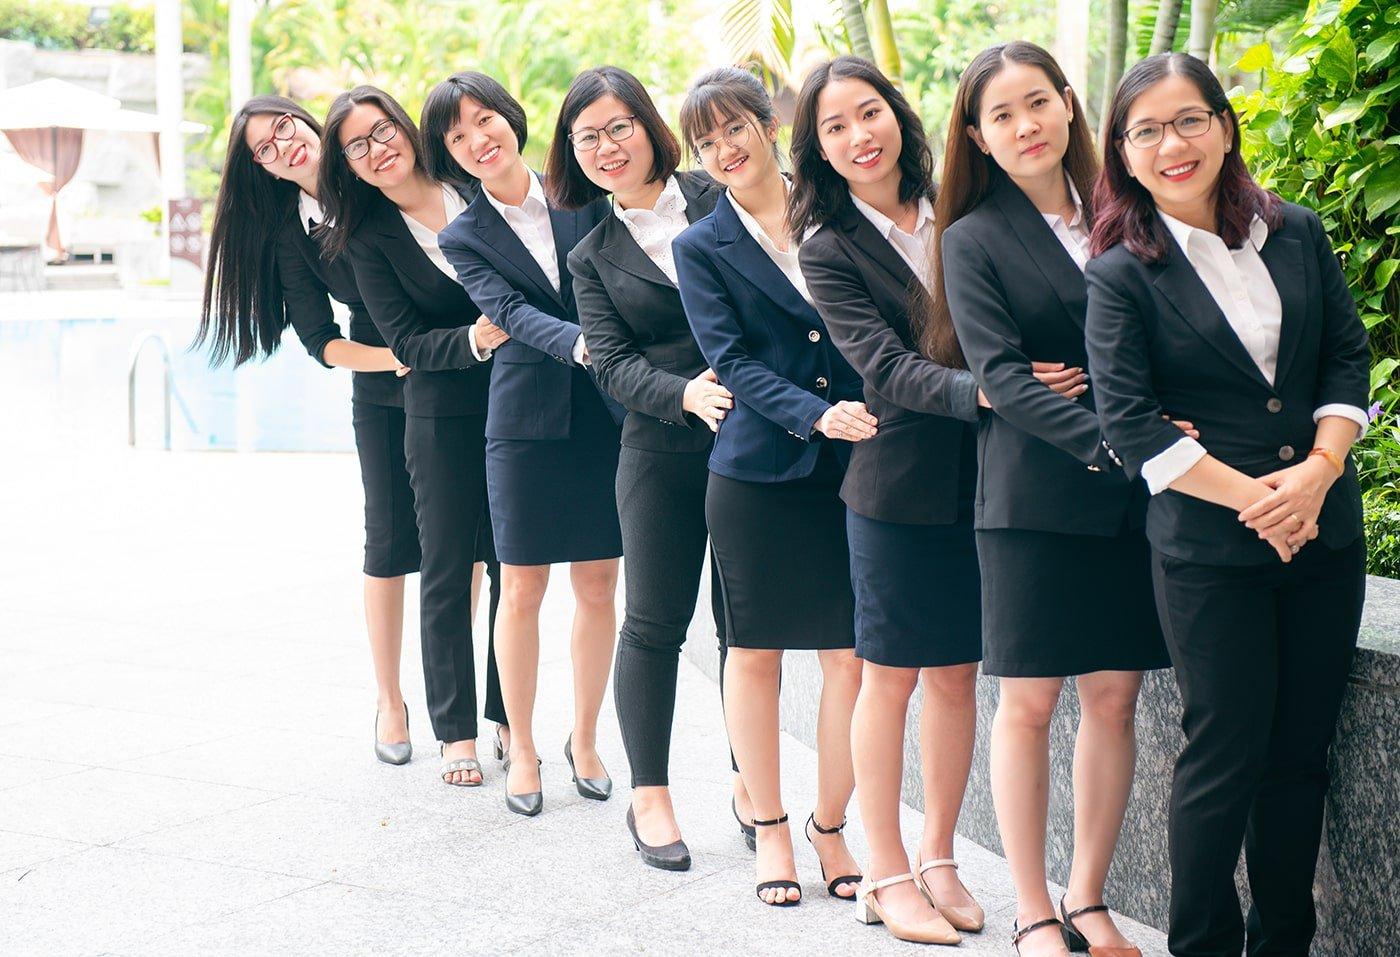 Profile cong ty 1 - Album chụp ảnh profile công ty Luật Dzungsrt Law - HThao Studio